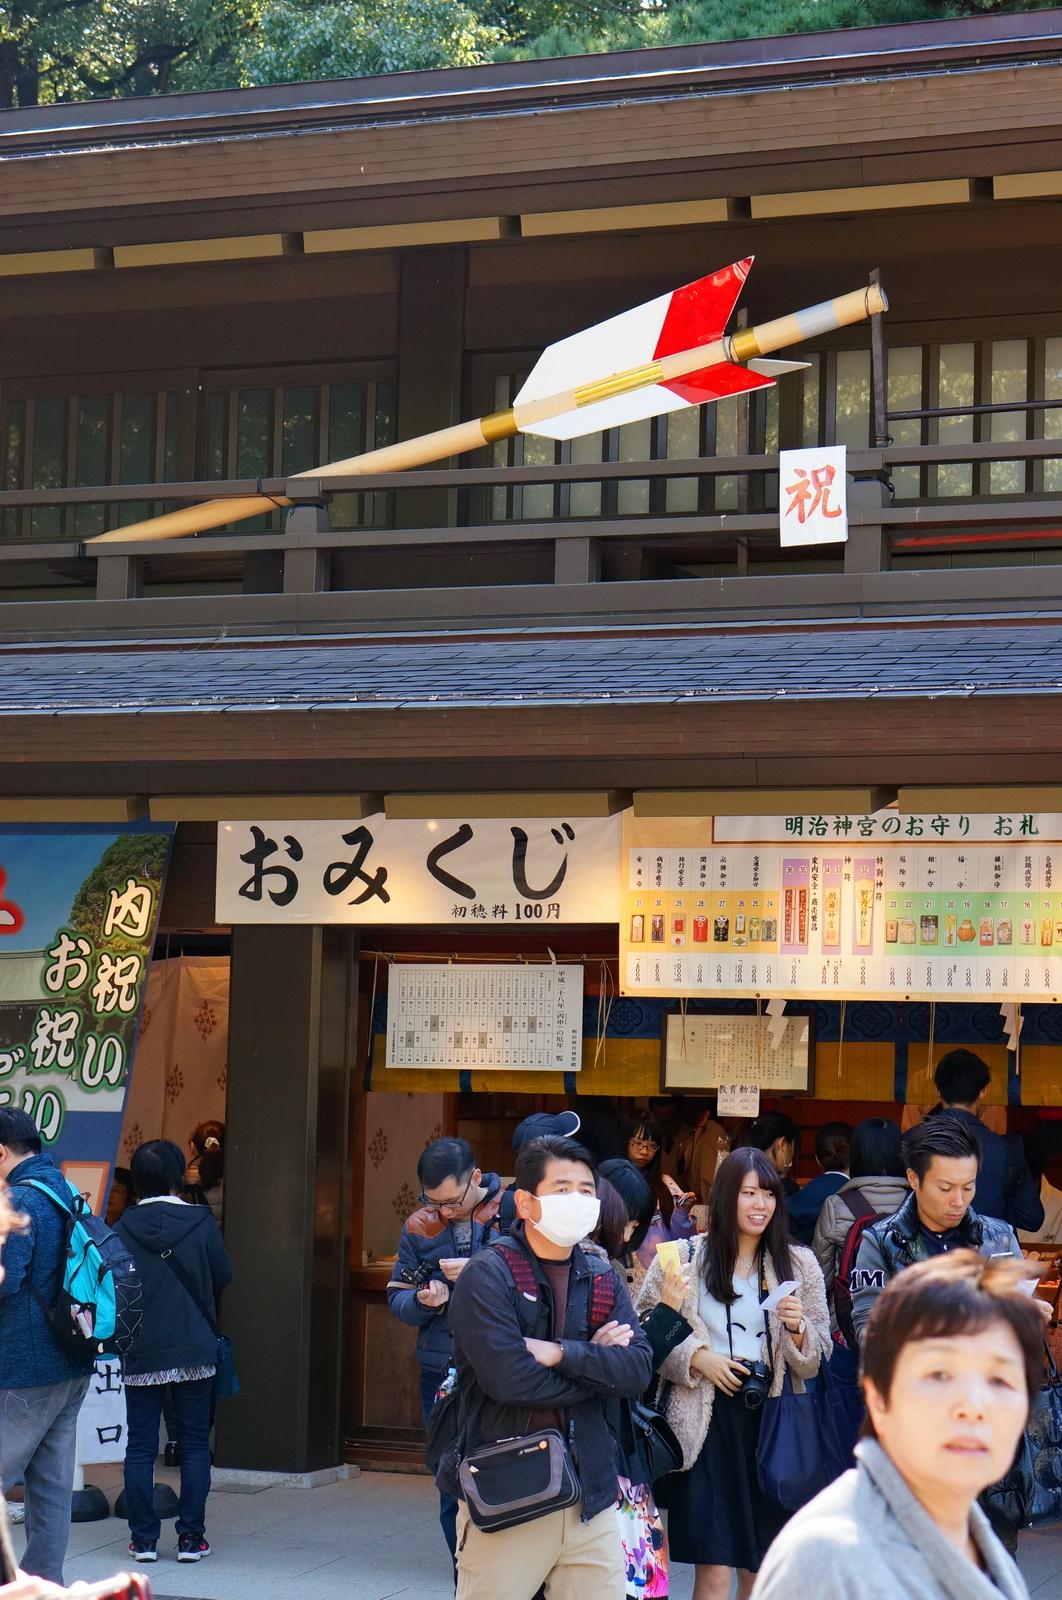 meiji-jingu, yoyogi, tokyo city guide, tokyo, japan trip, voyage au japon, sanctuaire meiju-jingu